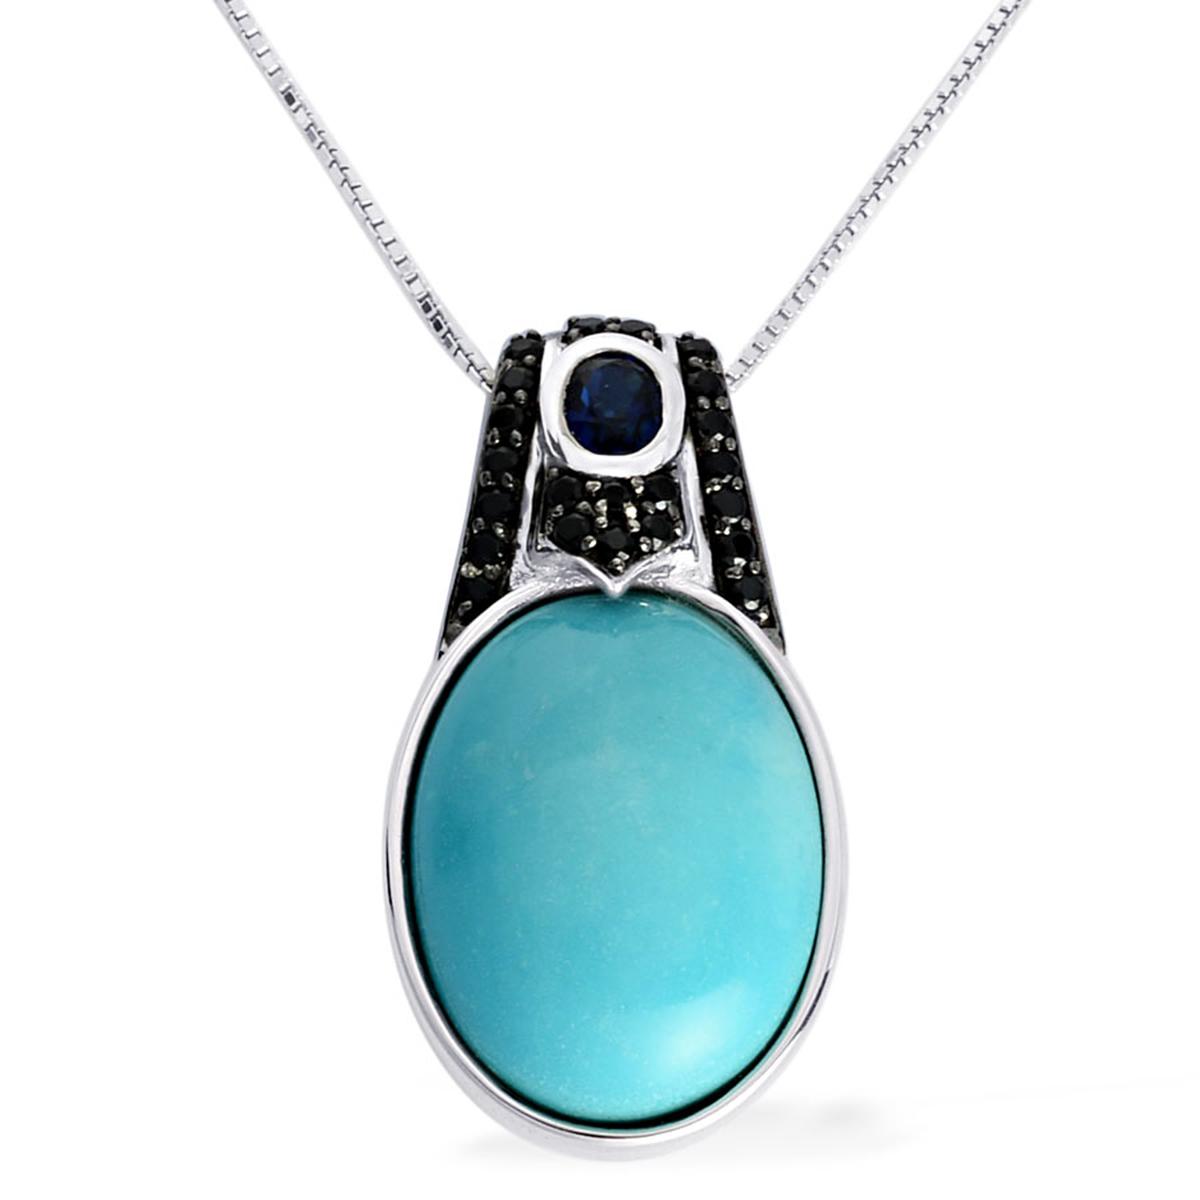 14K WG Arizona Sleeping Beauty Turquoise, Swiss Blue Topaz, Thai Black Spinel Pendant With Chain (16-18 in) TGW 13.10 cts.